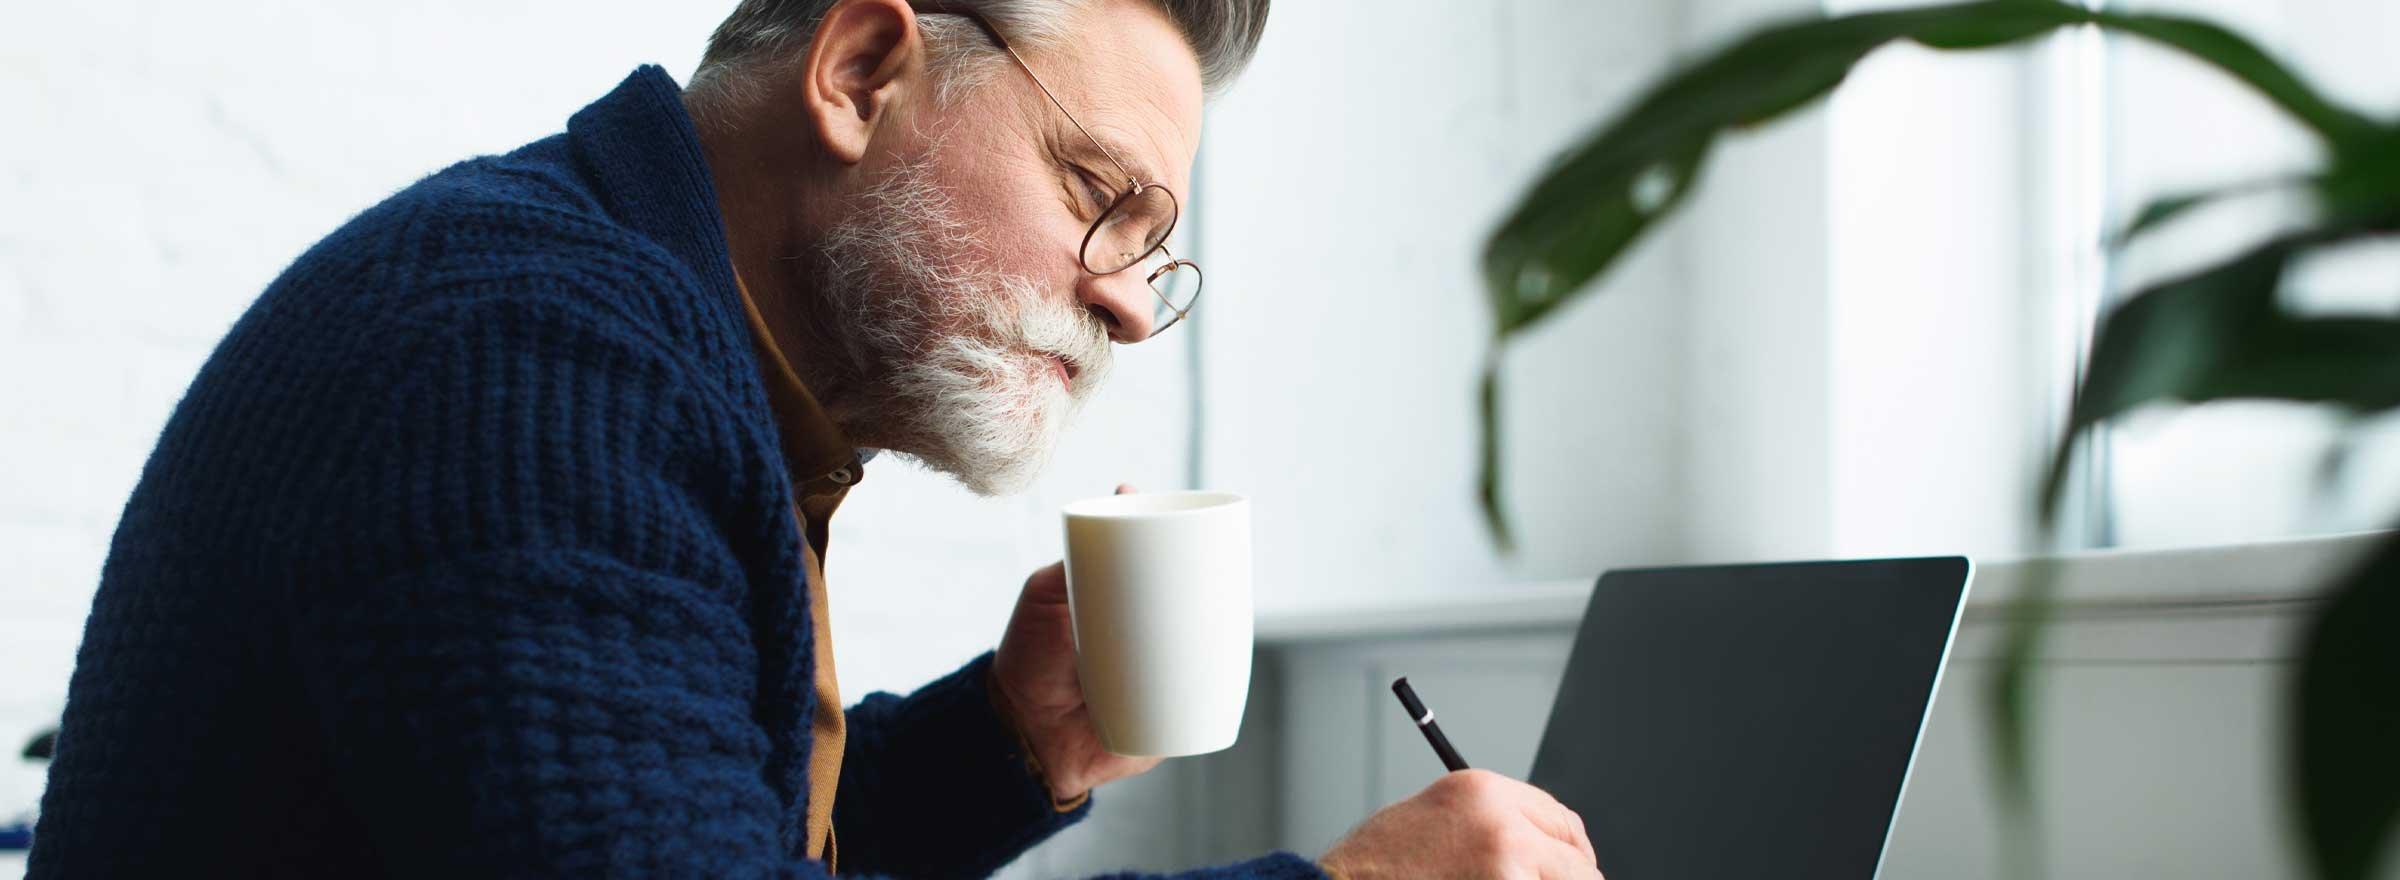 man with a mug, a laptop, and a pen